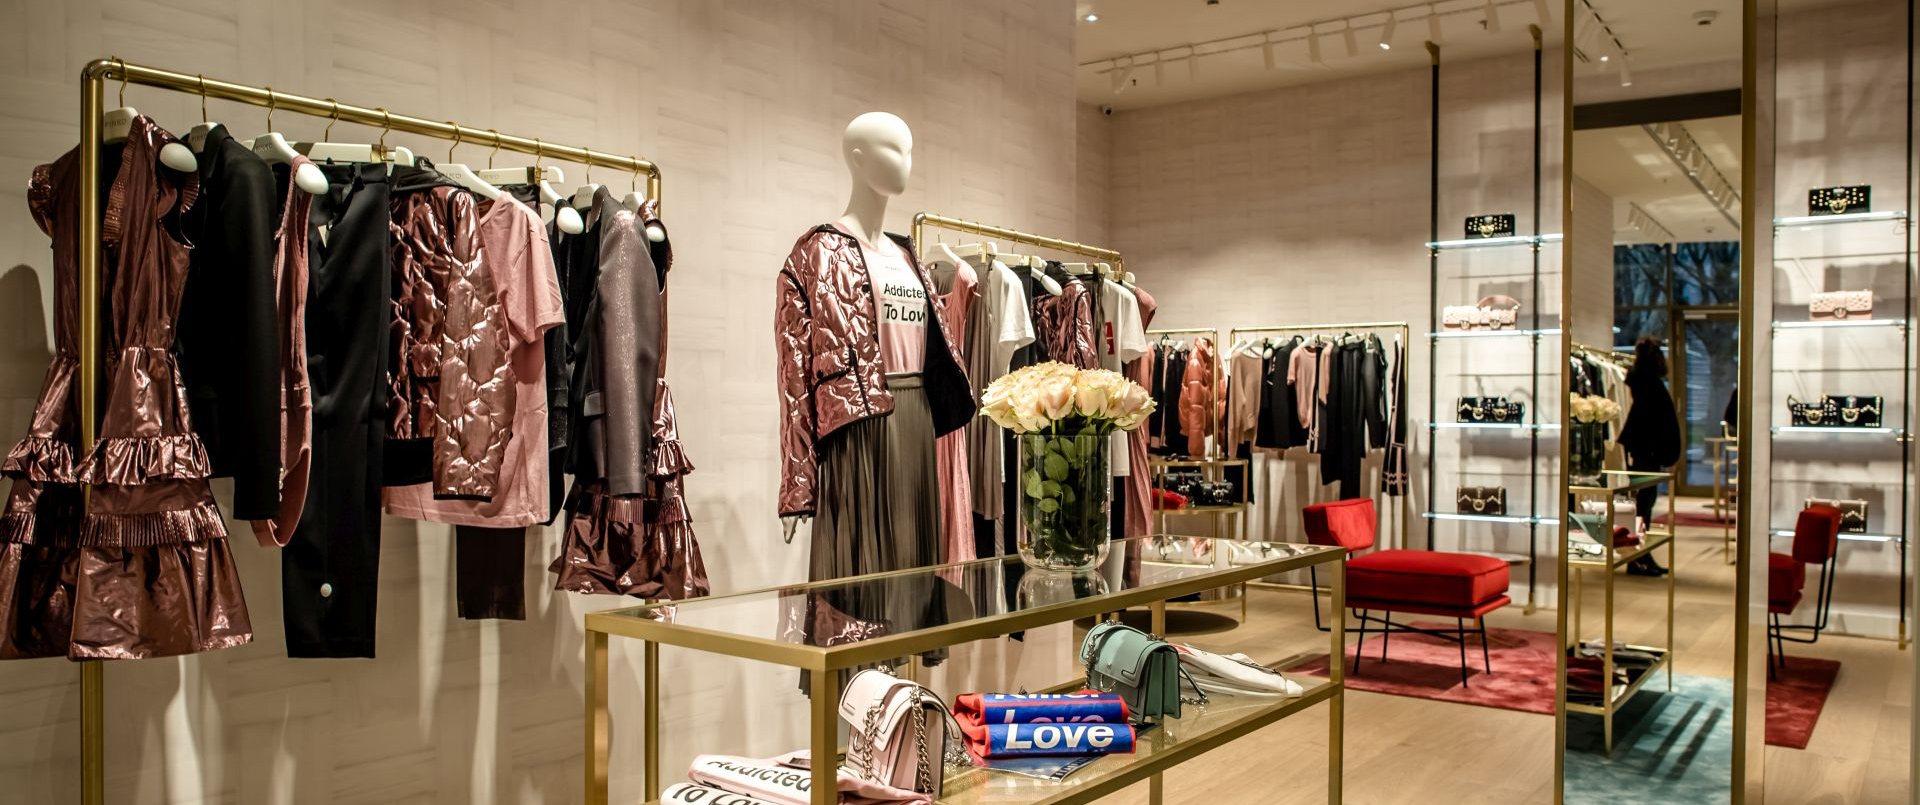 new product 8b386 46605 Edel-Design aus Italien: Pinko hat Store im Sevens eröffnet